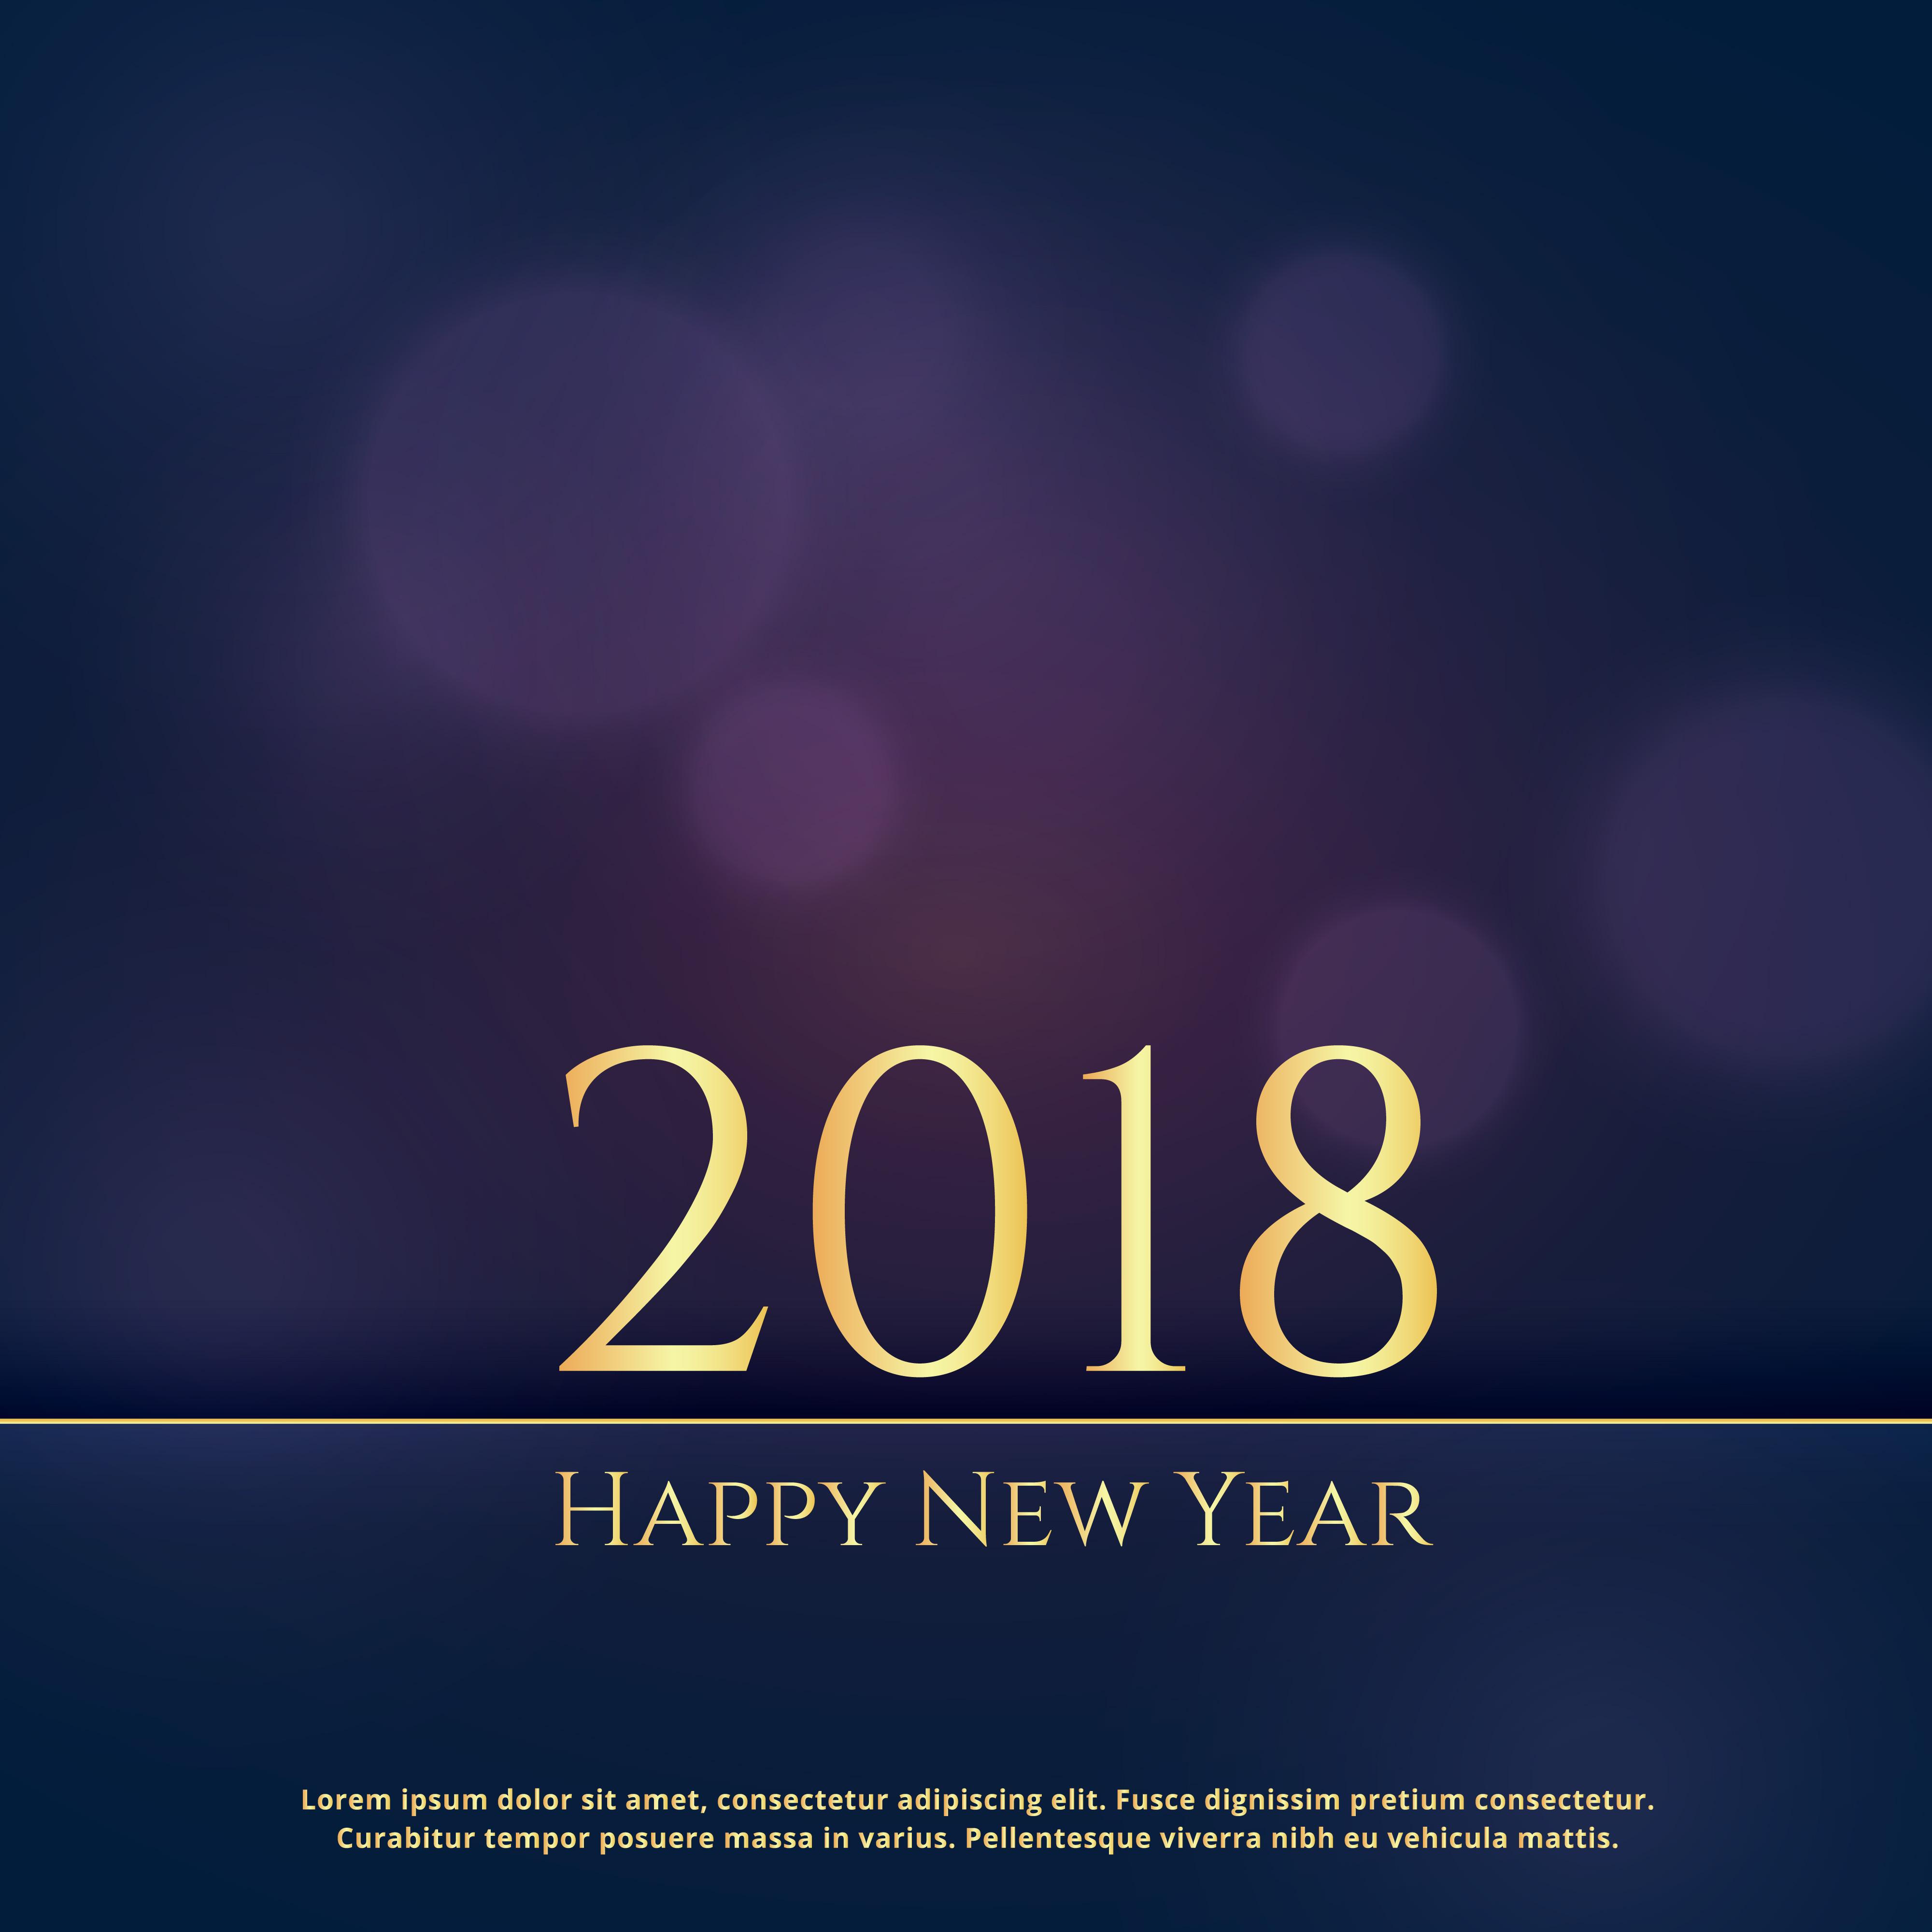 Elegant premium 2018 new year greeting card design background elegant premium 2018 new year greeting card design background download free vector art stock graphics images kristyandbryce Choice Image